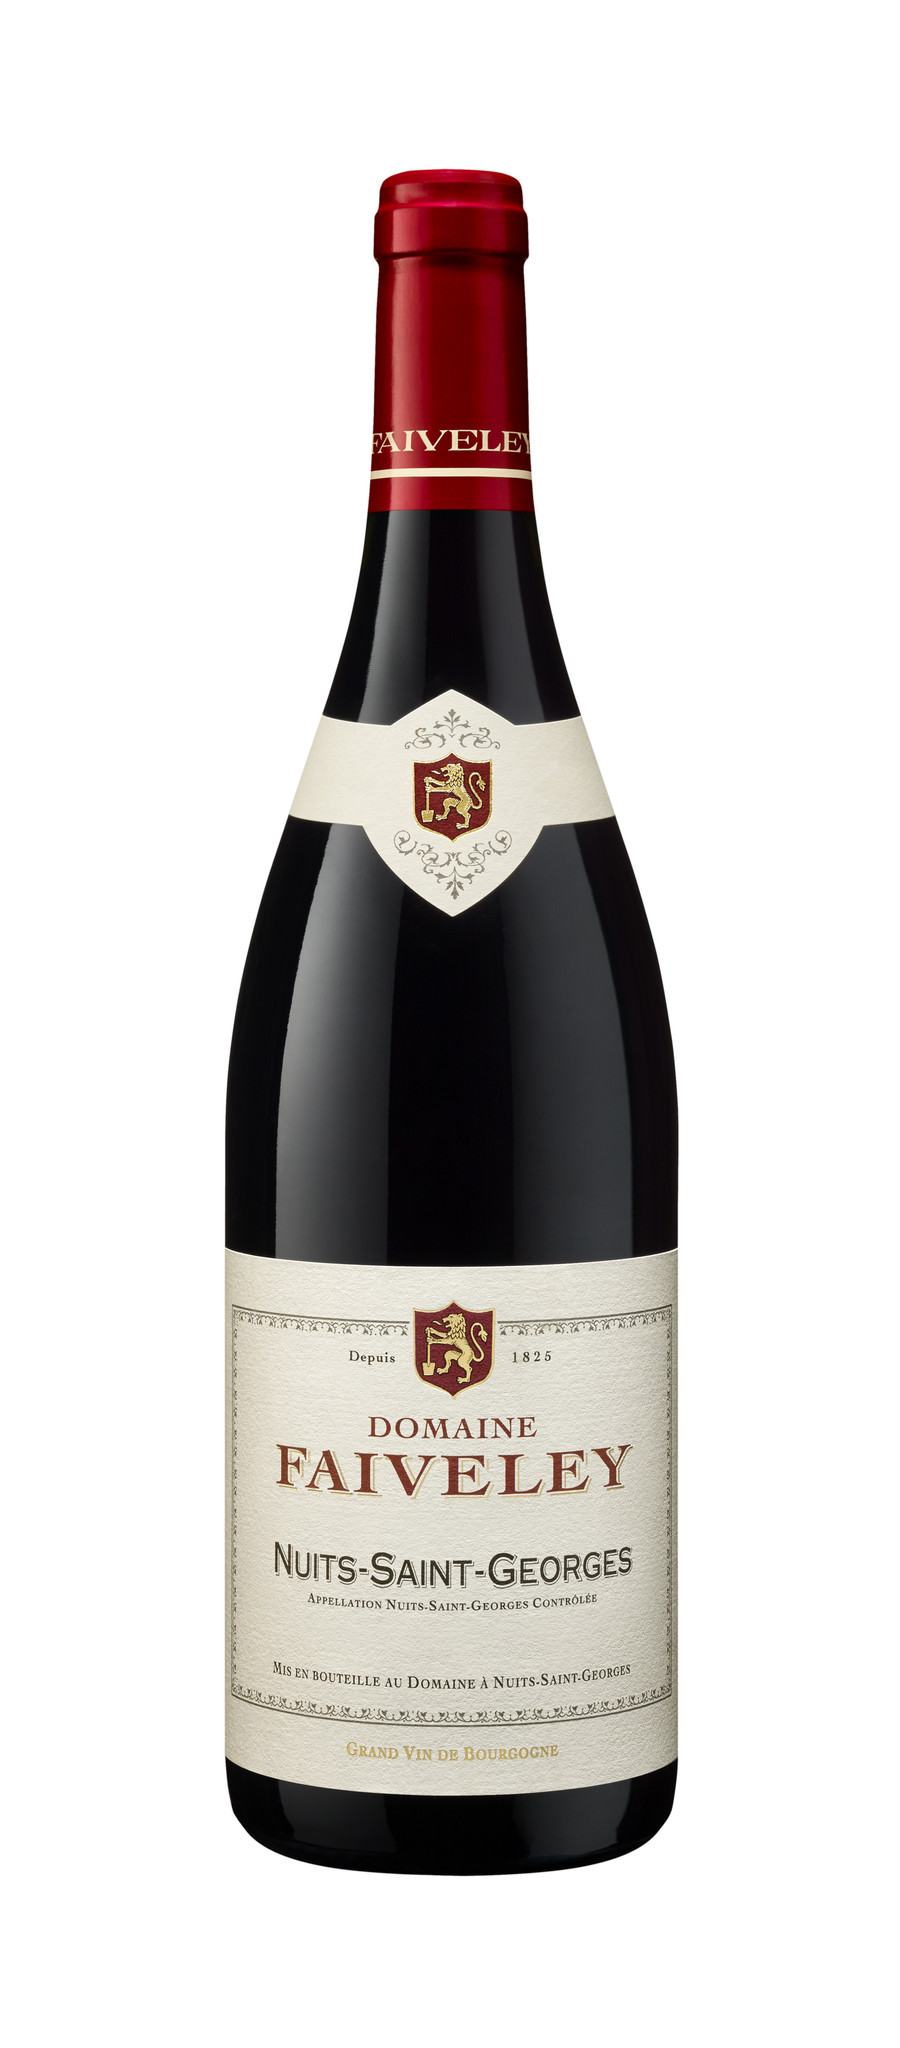 Faiveley, Domaine - Burgund 2018 Nuits-Saint-Georges, Domaine Faiveley